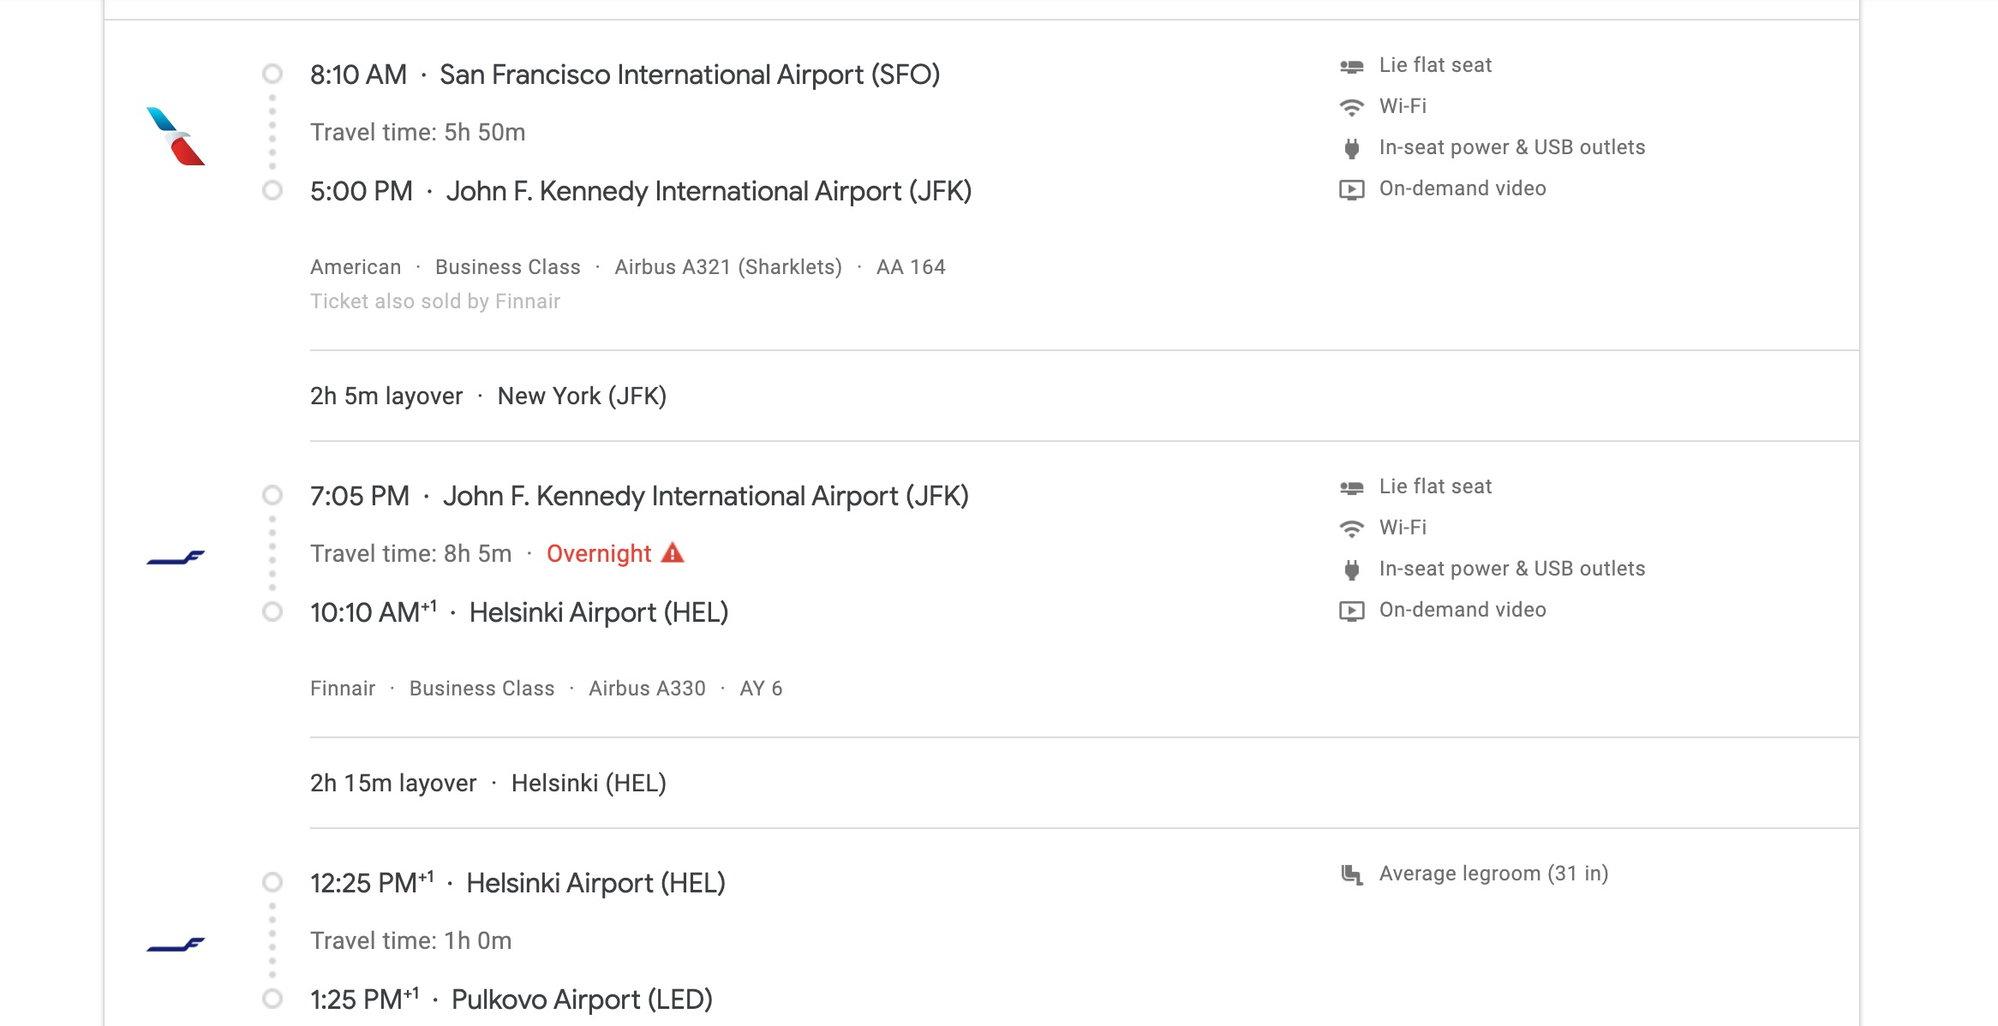 Oneworld Sfo Led 2 018 Rt Business Flyertalk Forums